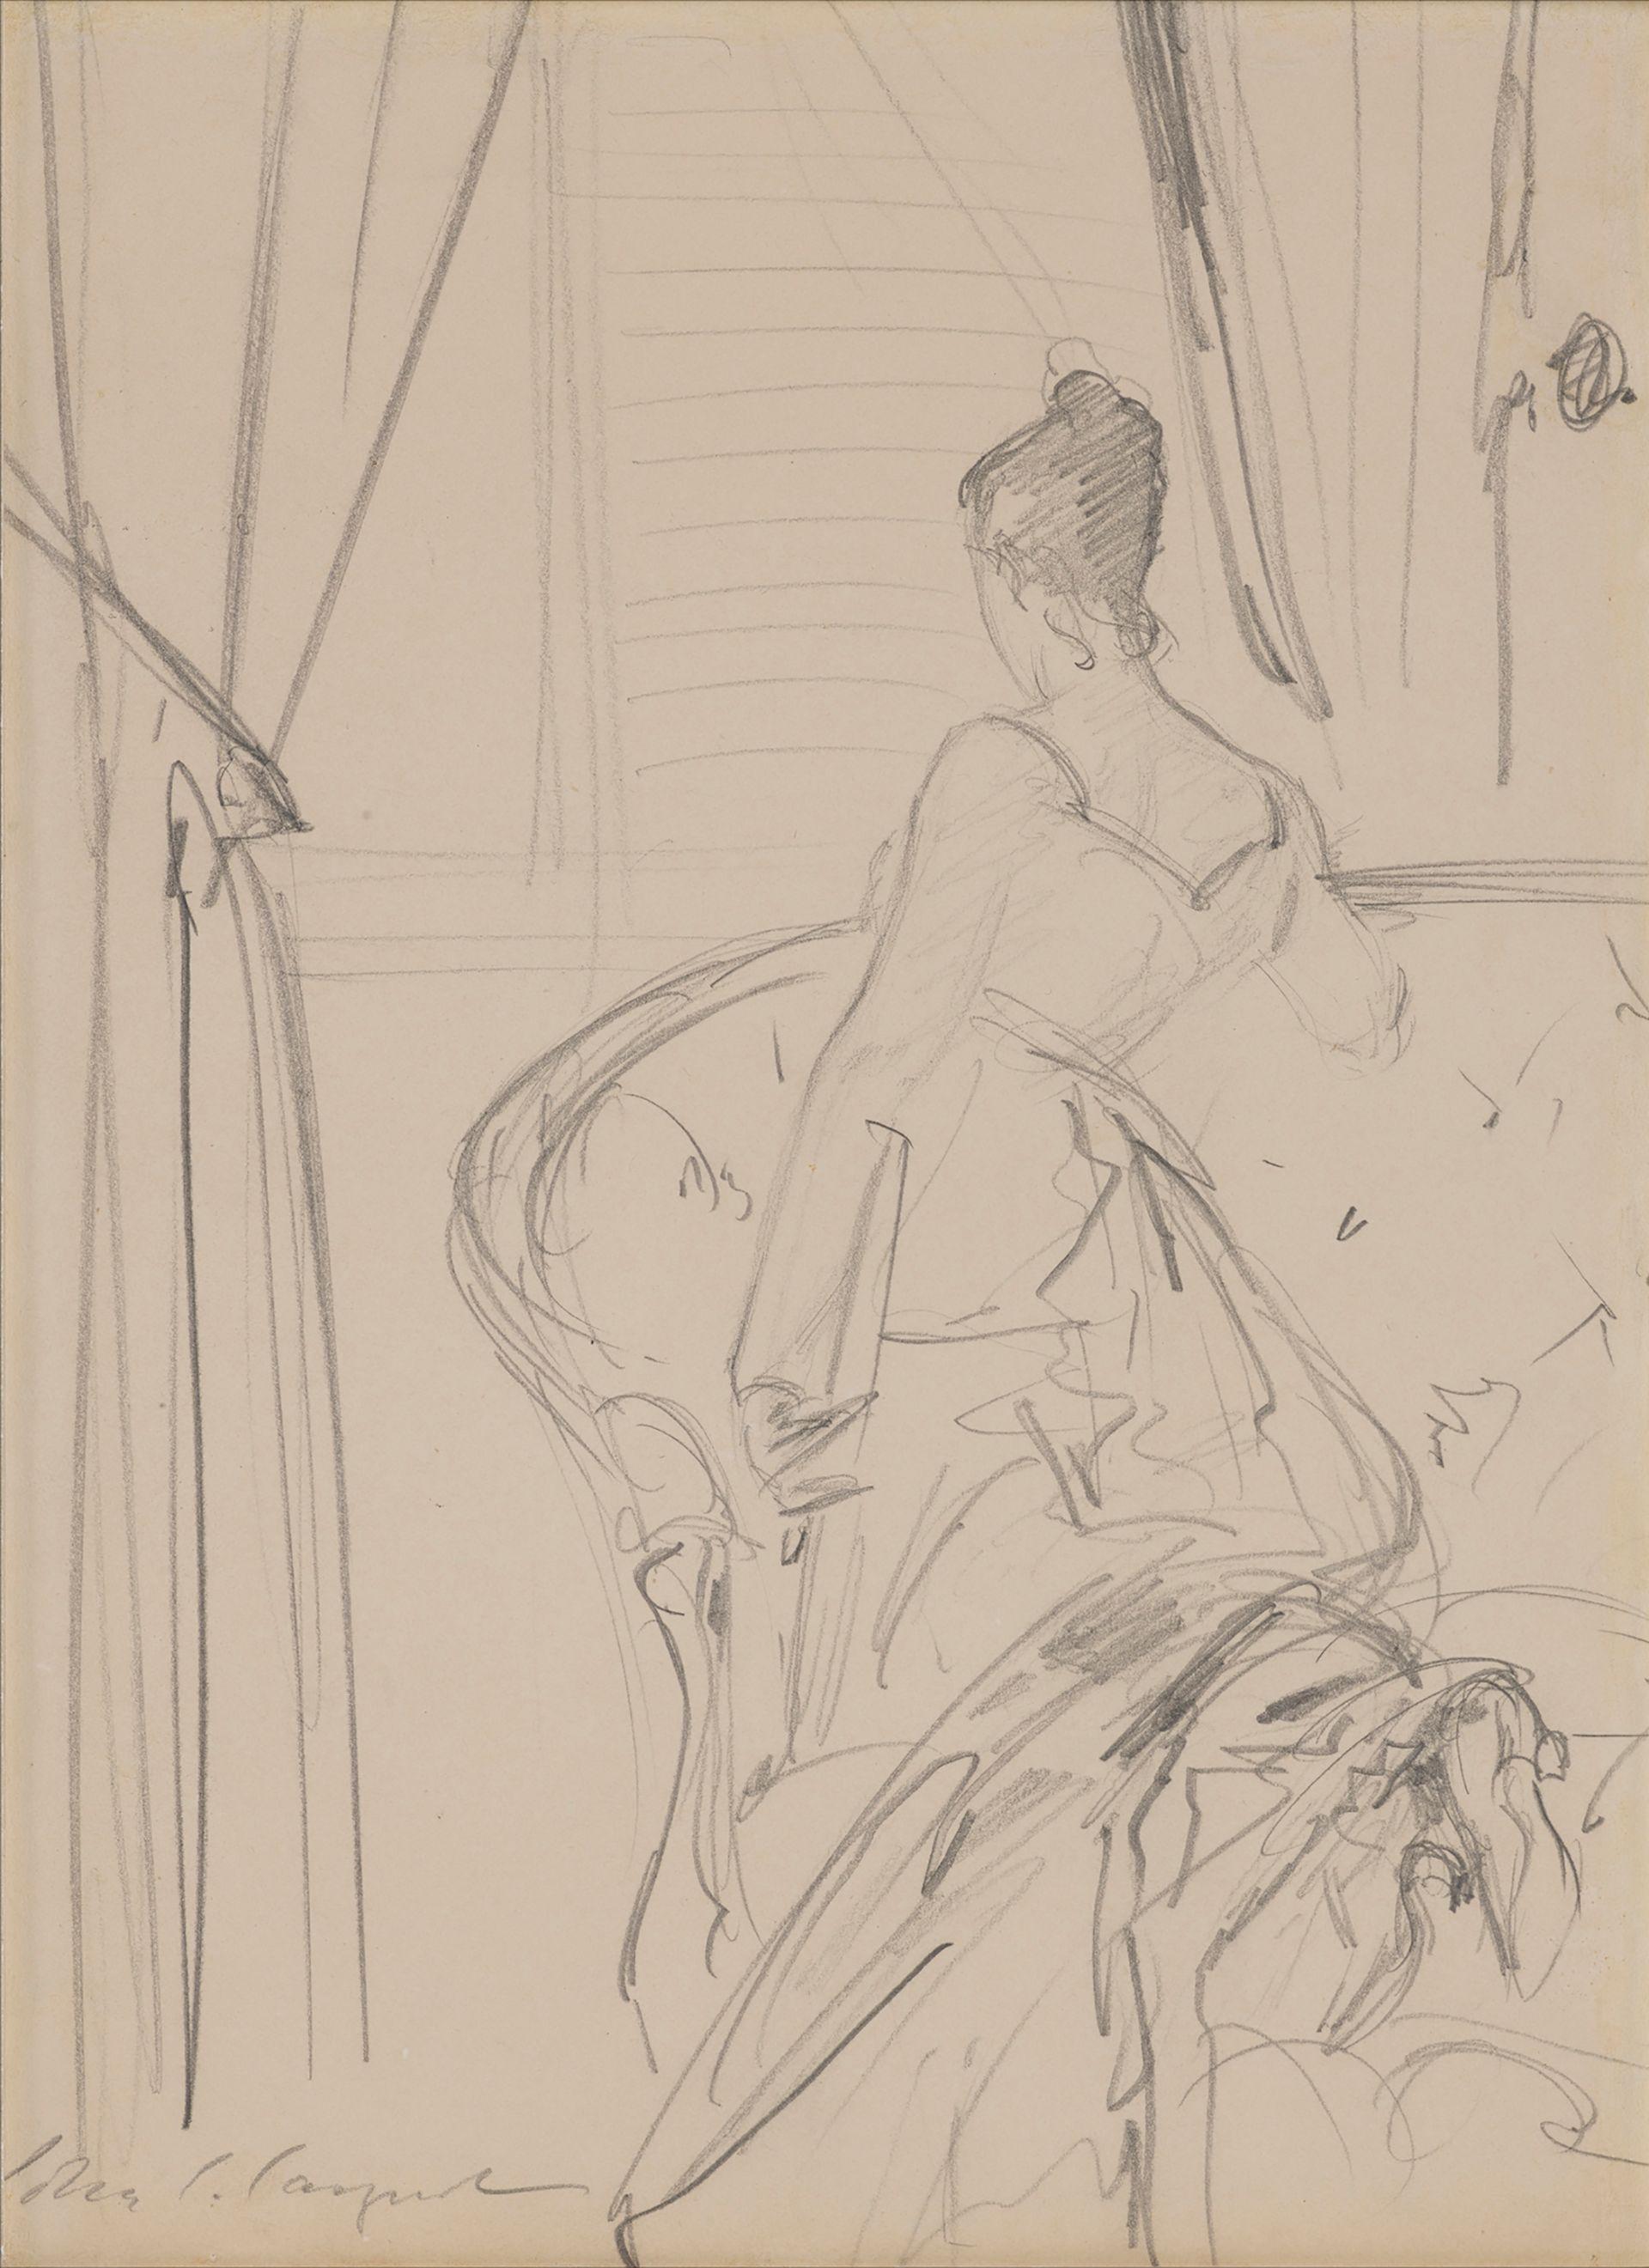 John Singer Sargent's Virginie Amélie Avegno, Mme. Gautreau (Mme. X), from around 1884 Photo: Joseph Coscia Jr